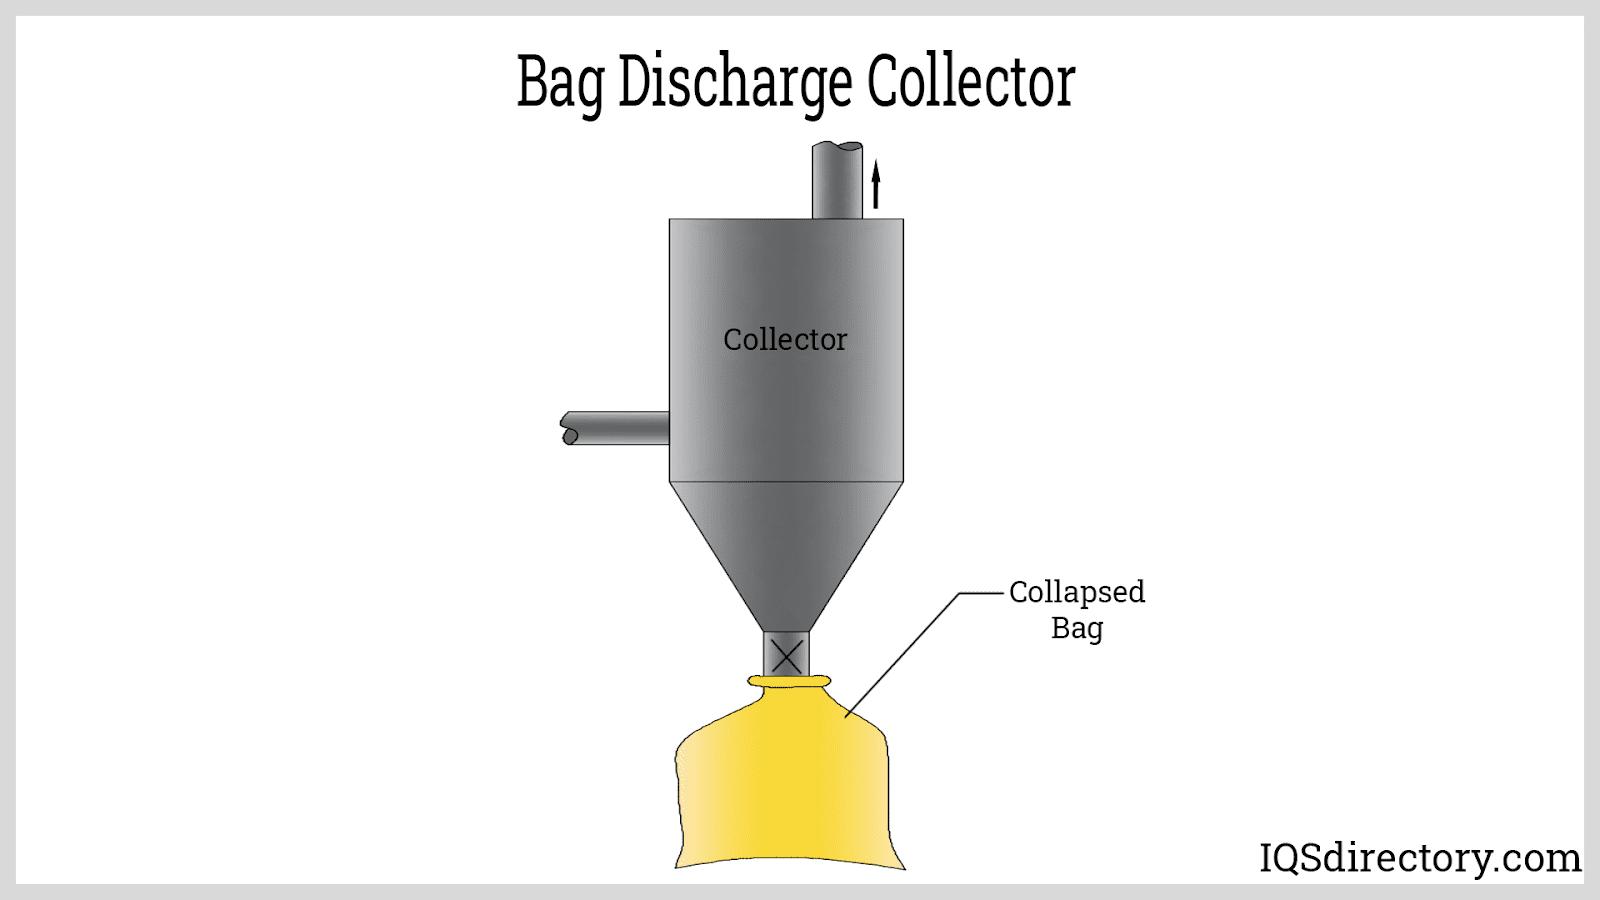 Bag Discharge Collector